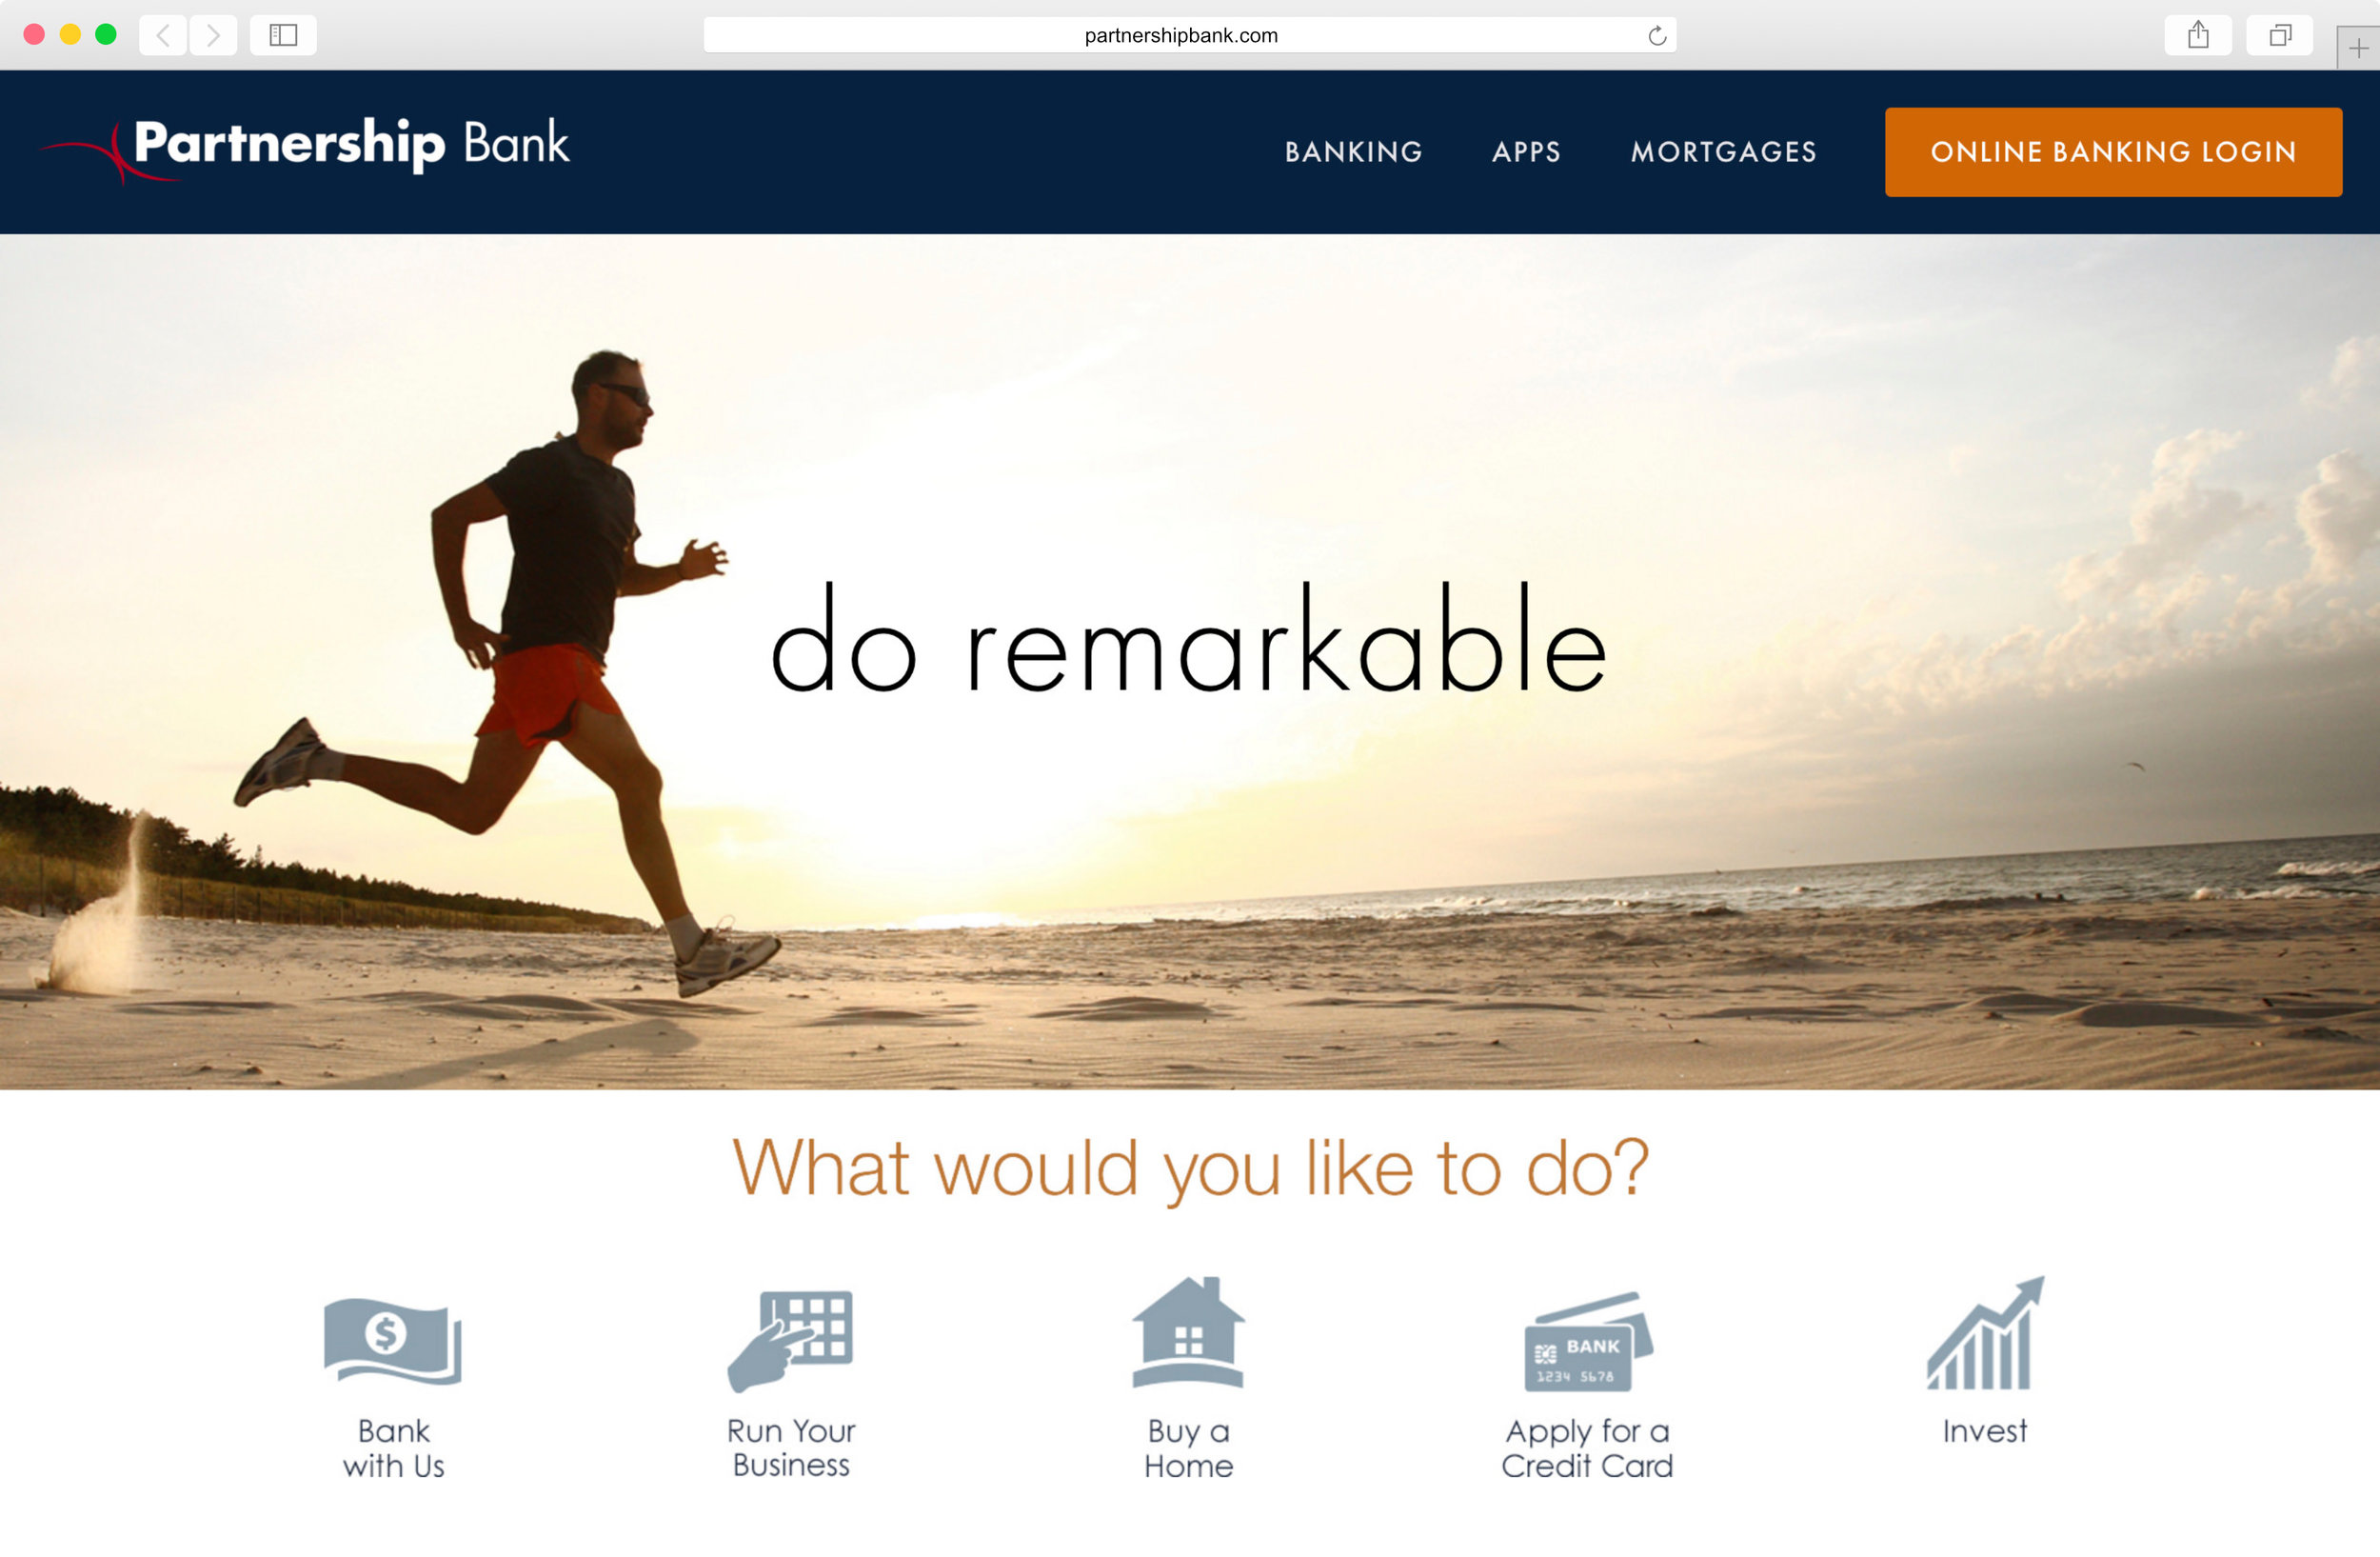 Partnership Bank